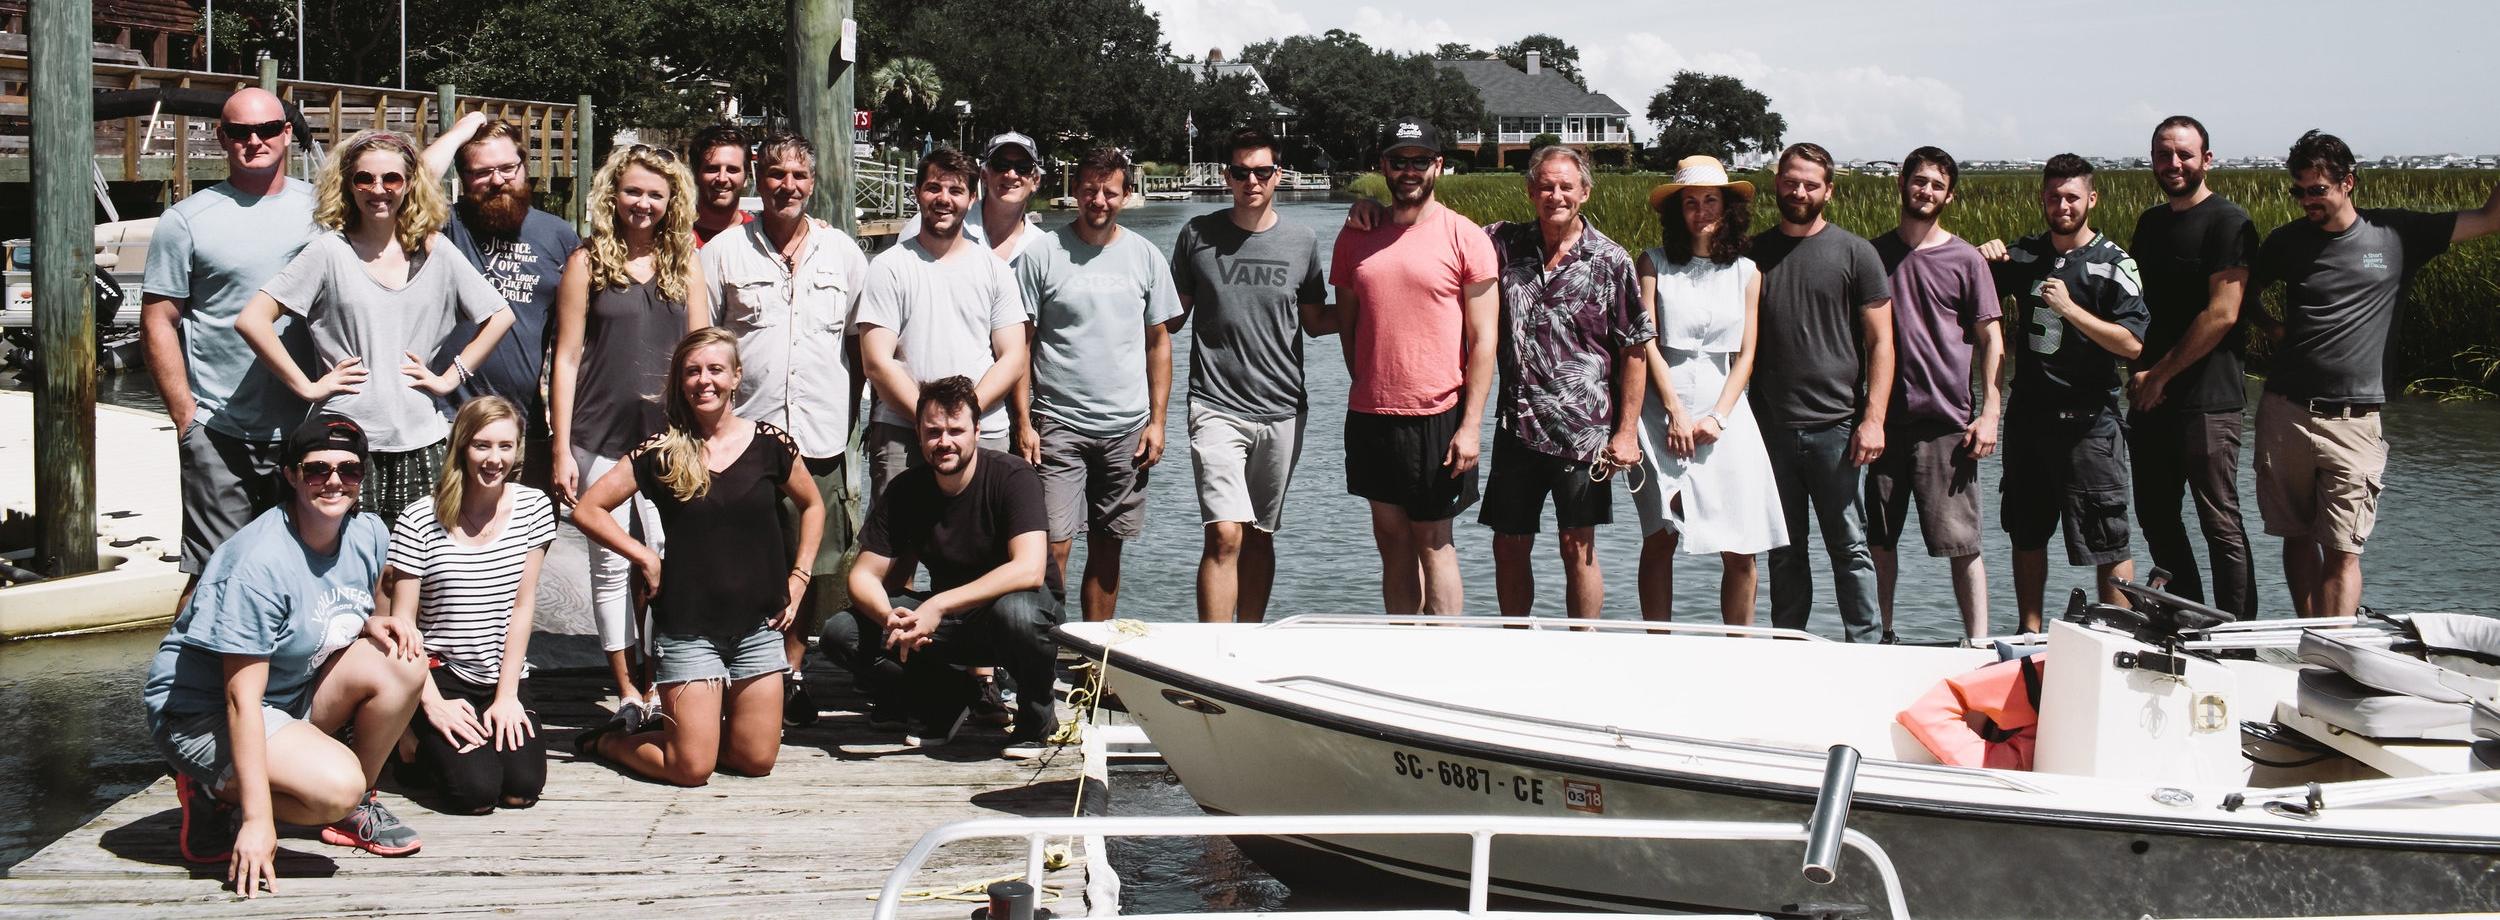 Crew - CrabTrap_Day4-14.jpg